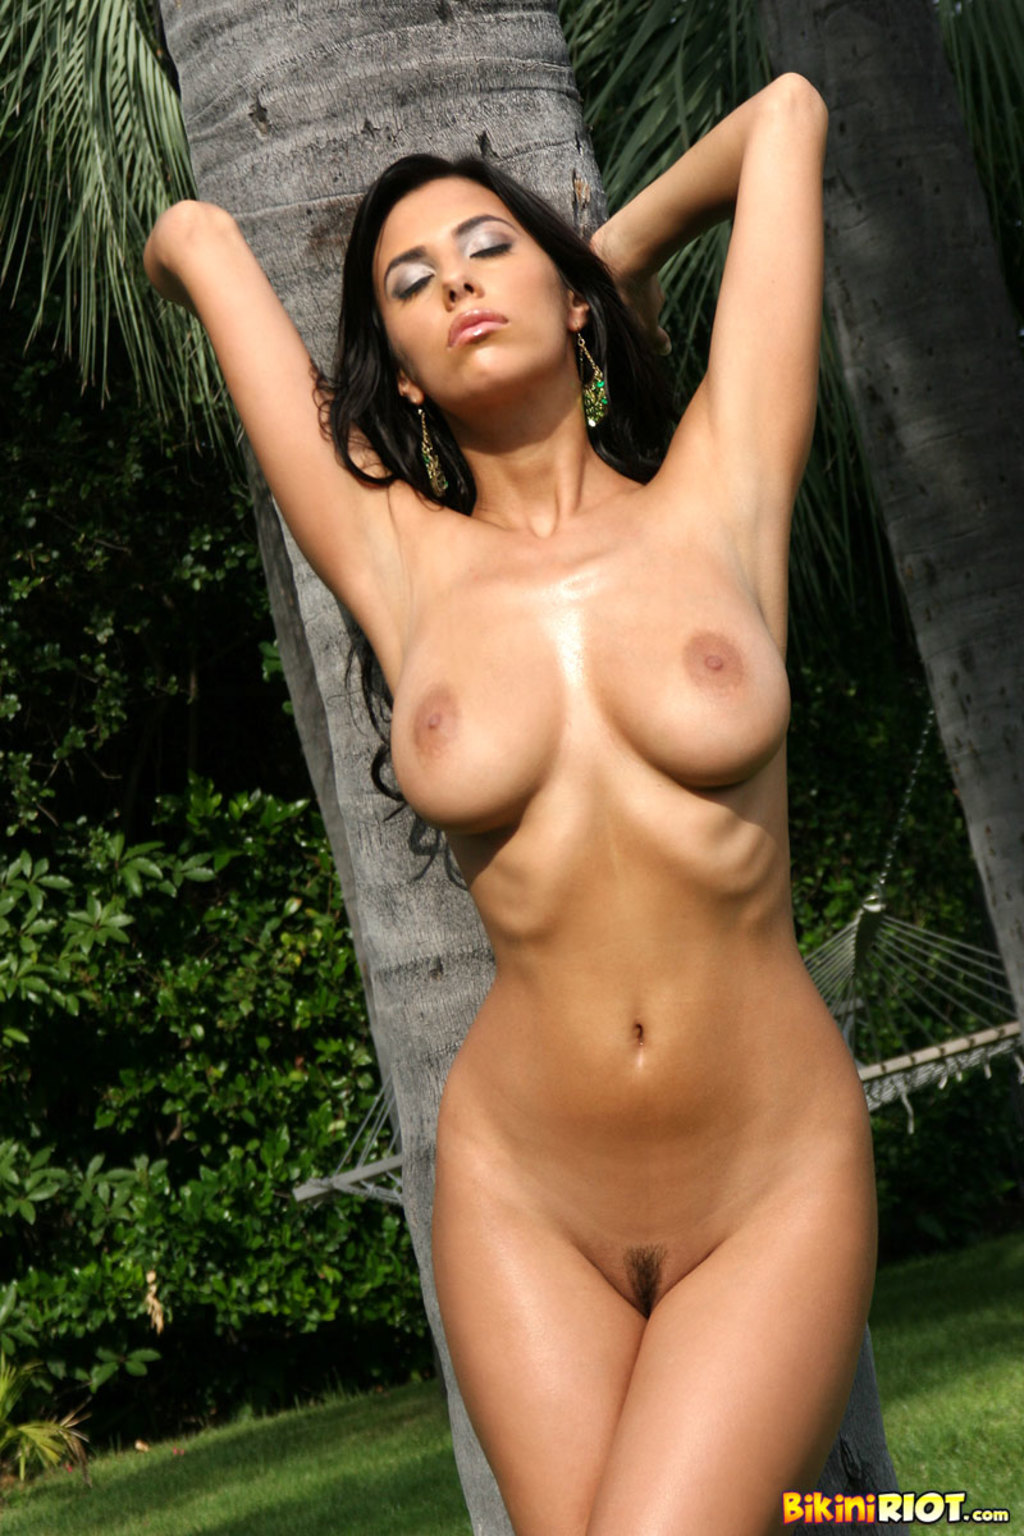 naturistbilder cecilia brækhus nude